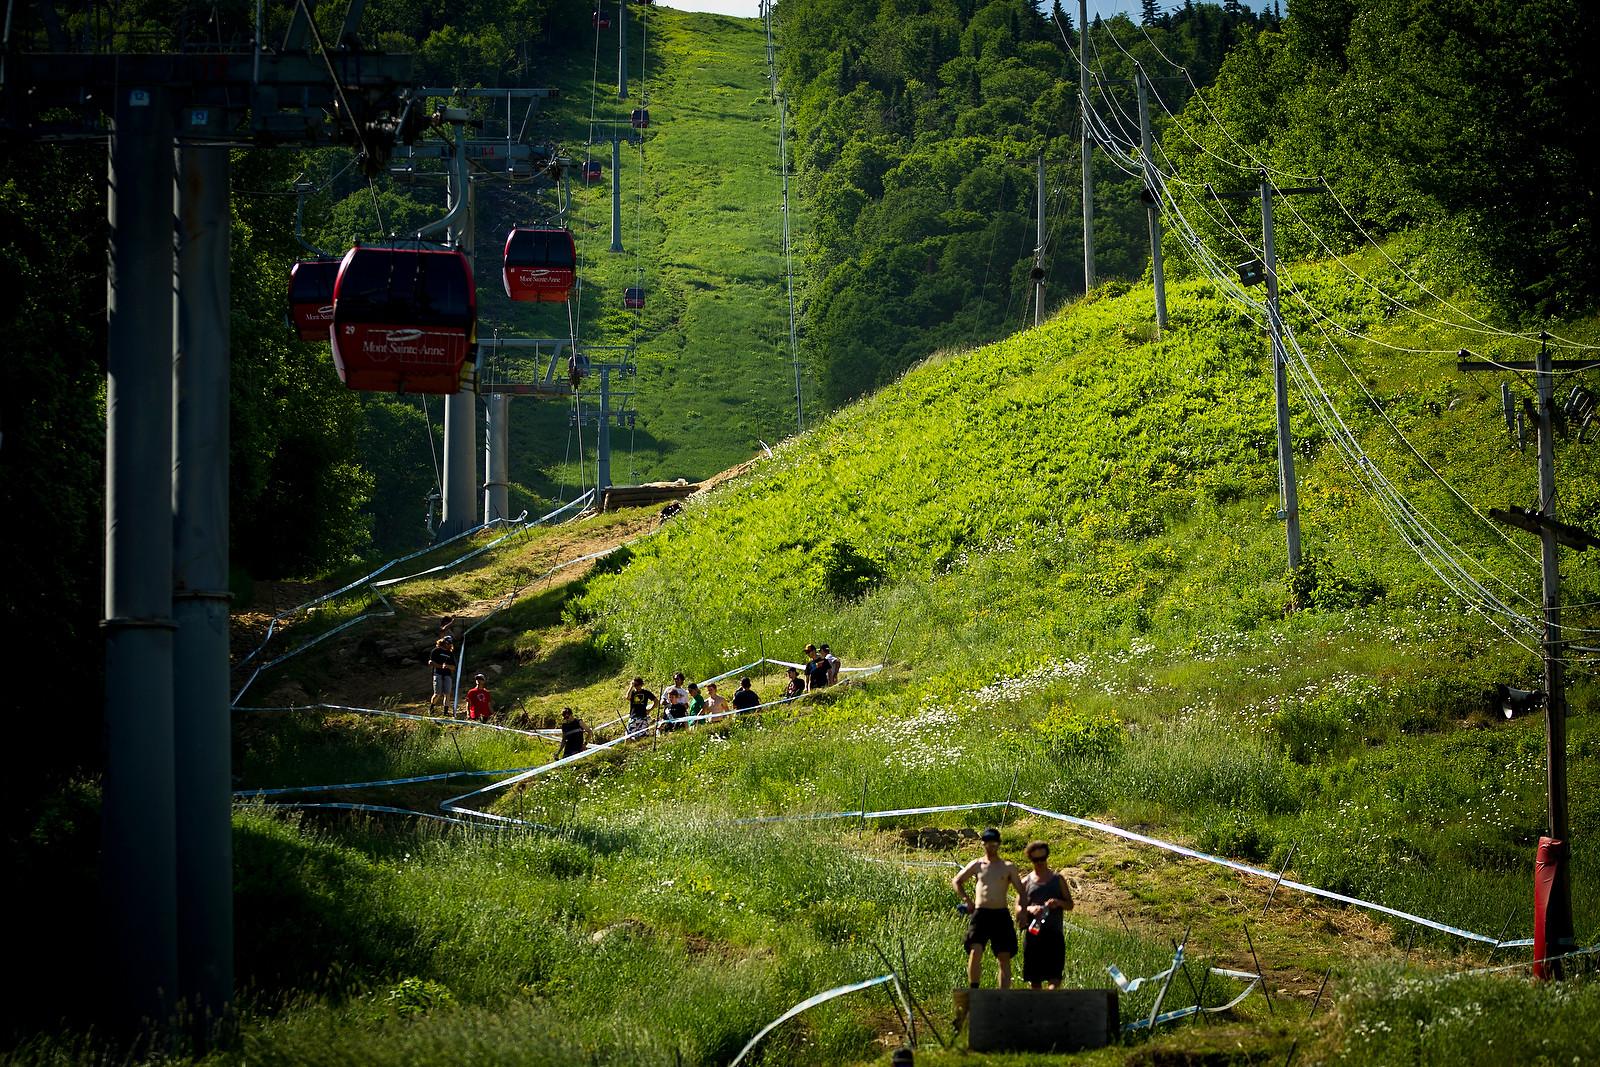 2012 Mont Sainte Anne Track Walk - 2012 UCI World Cup, Mont Sainte Anne, Day 1 - Mountain Biking Pictures - Vital MTB